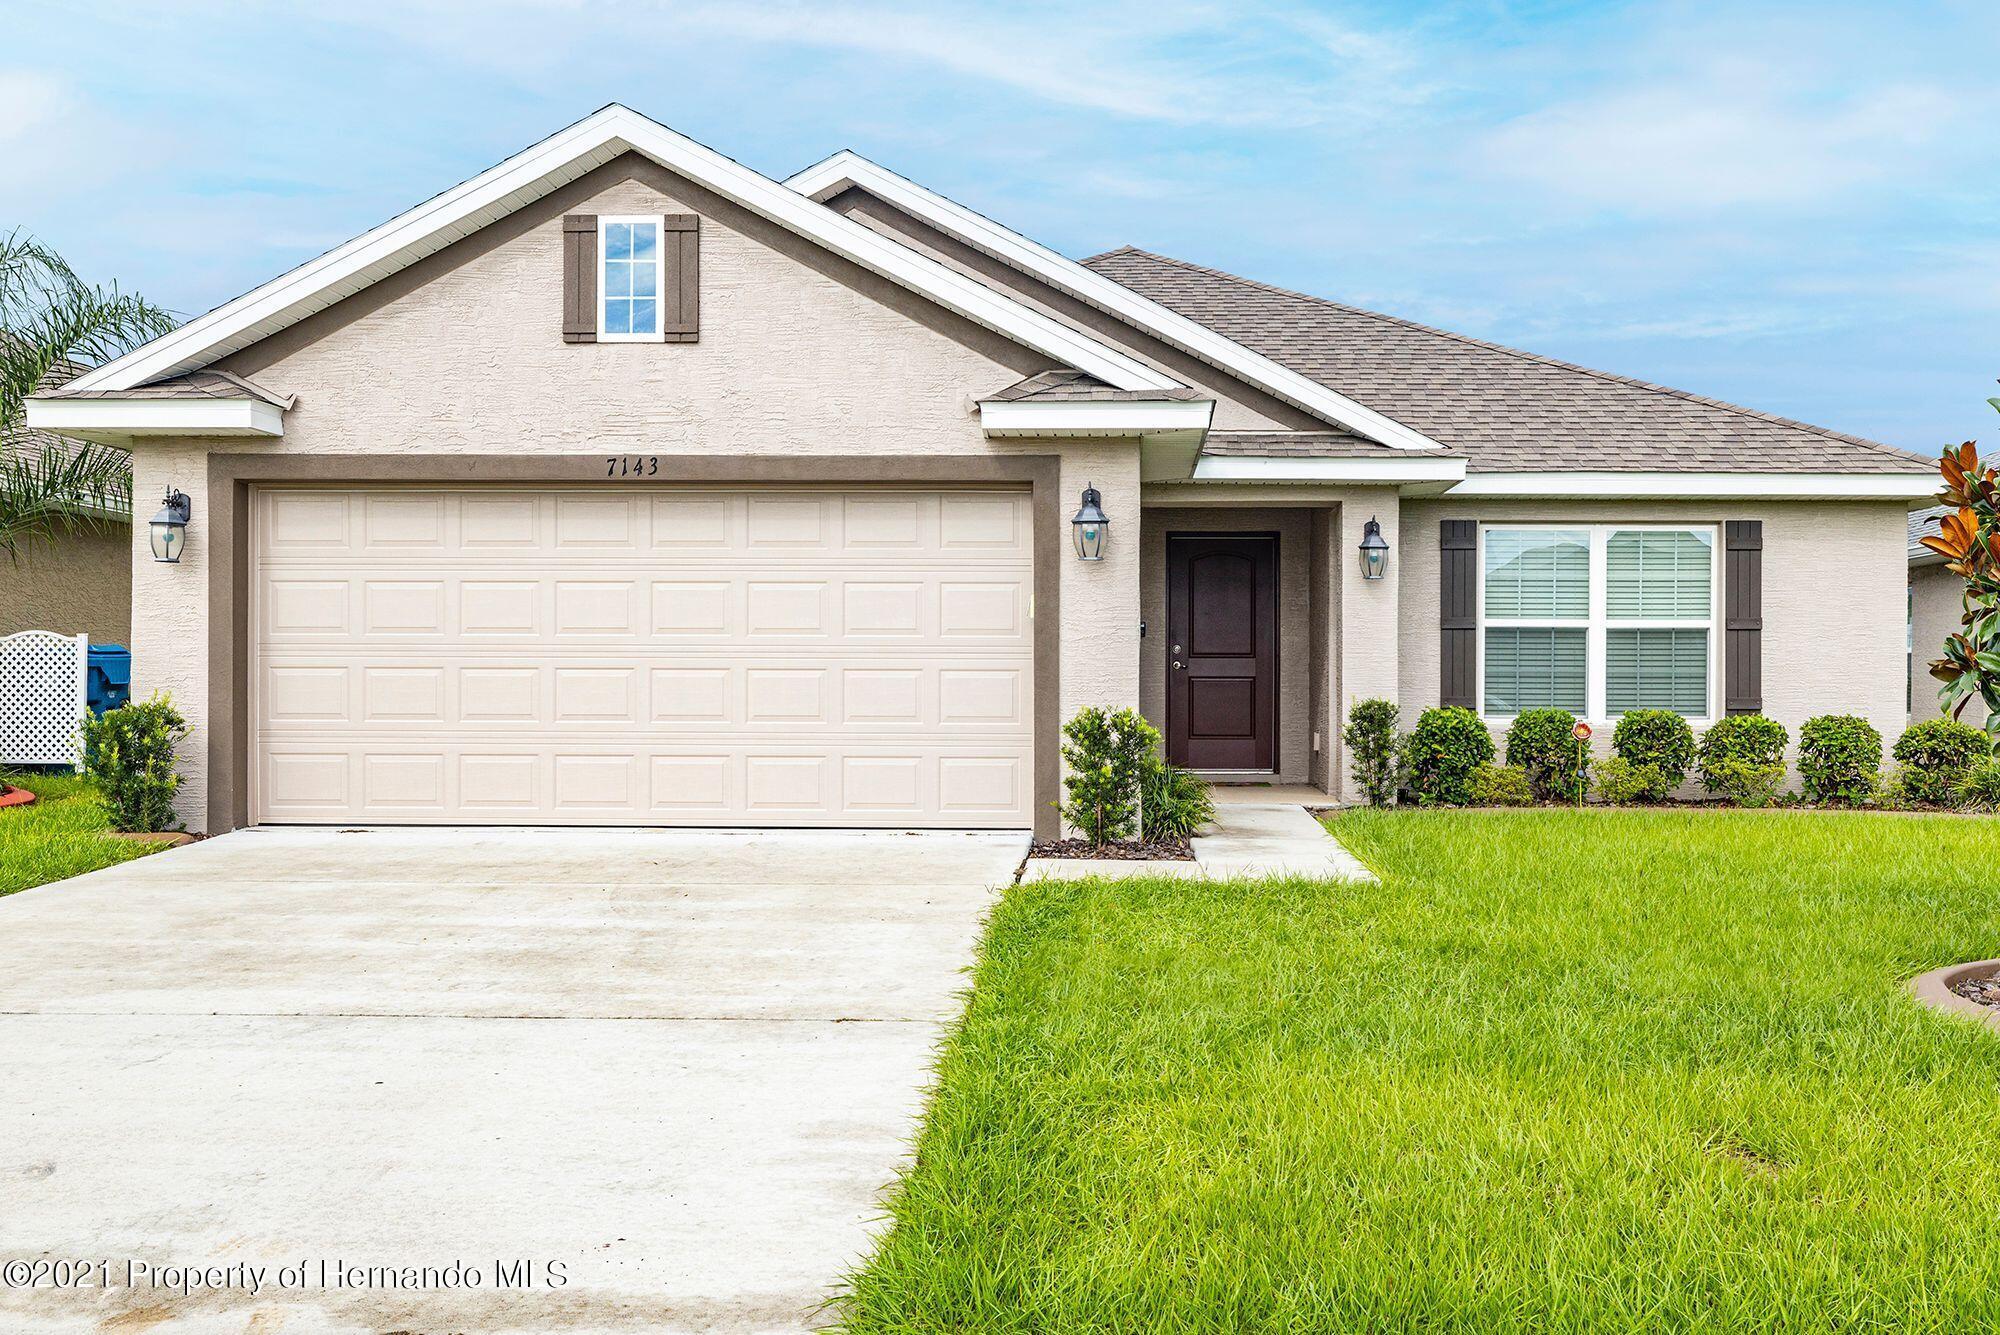 Details for 7143 Wirevine Drive, Brooksville, FL 34602